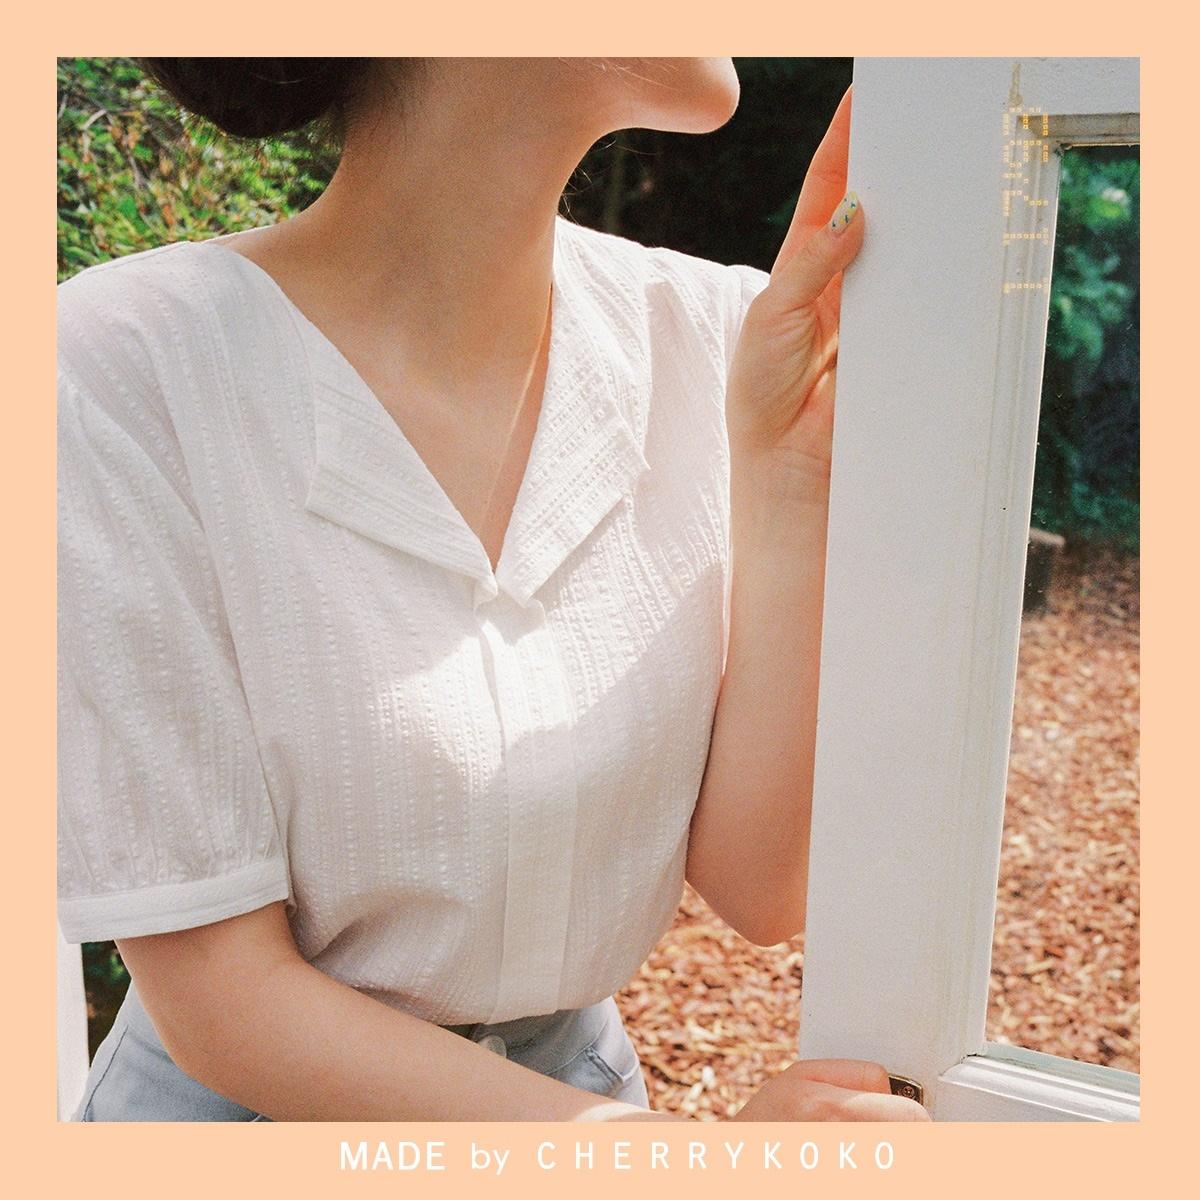 [CHERRYKOKO官方旗艦店] V領泡芙秀襯衫 / pelota blouse